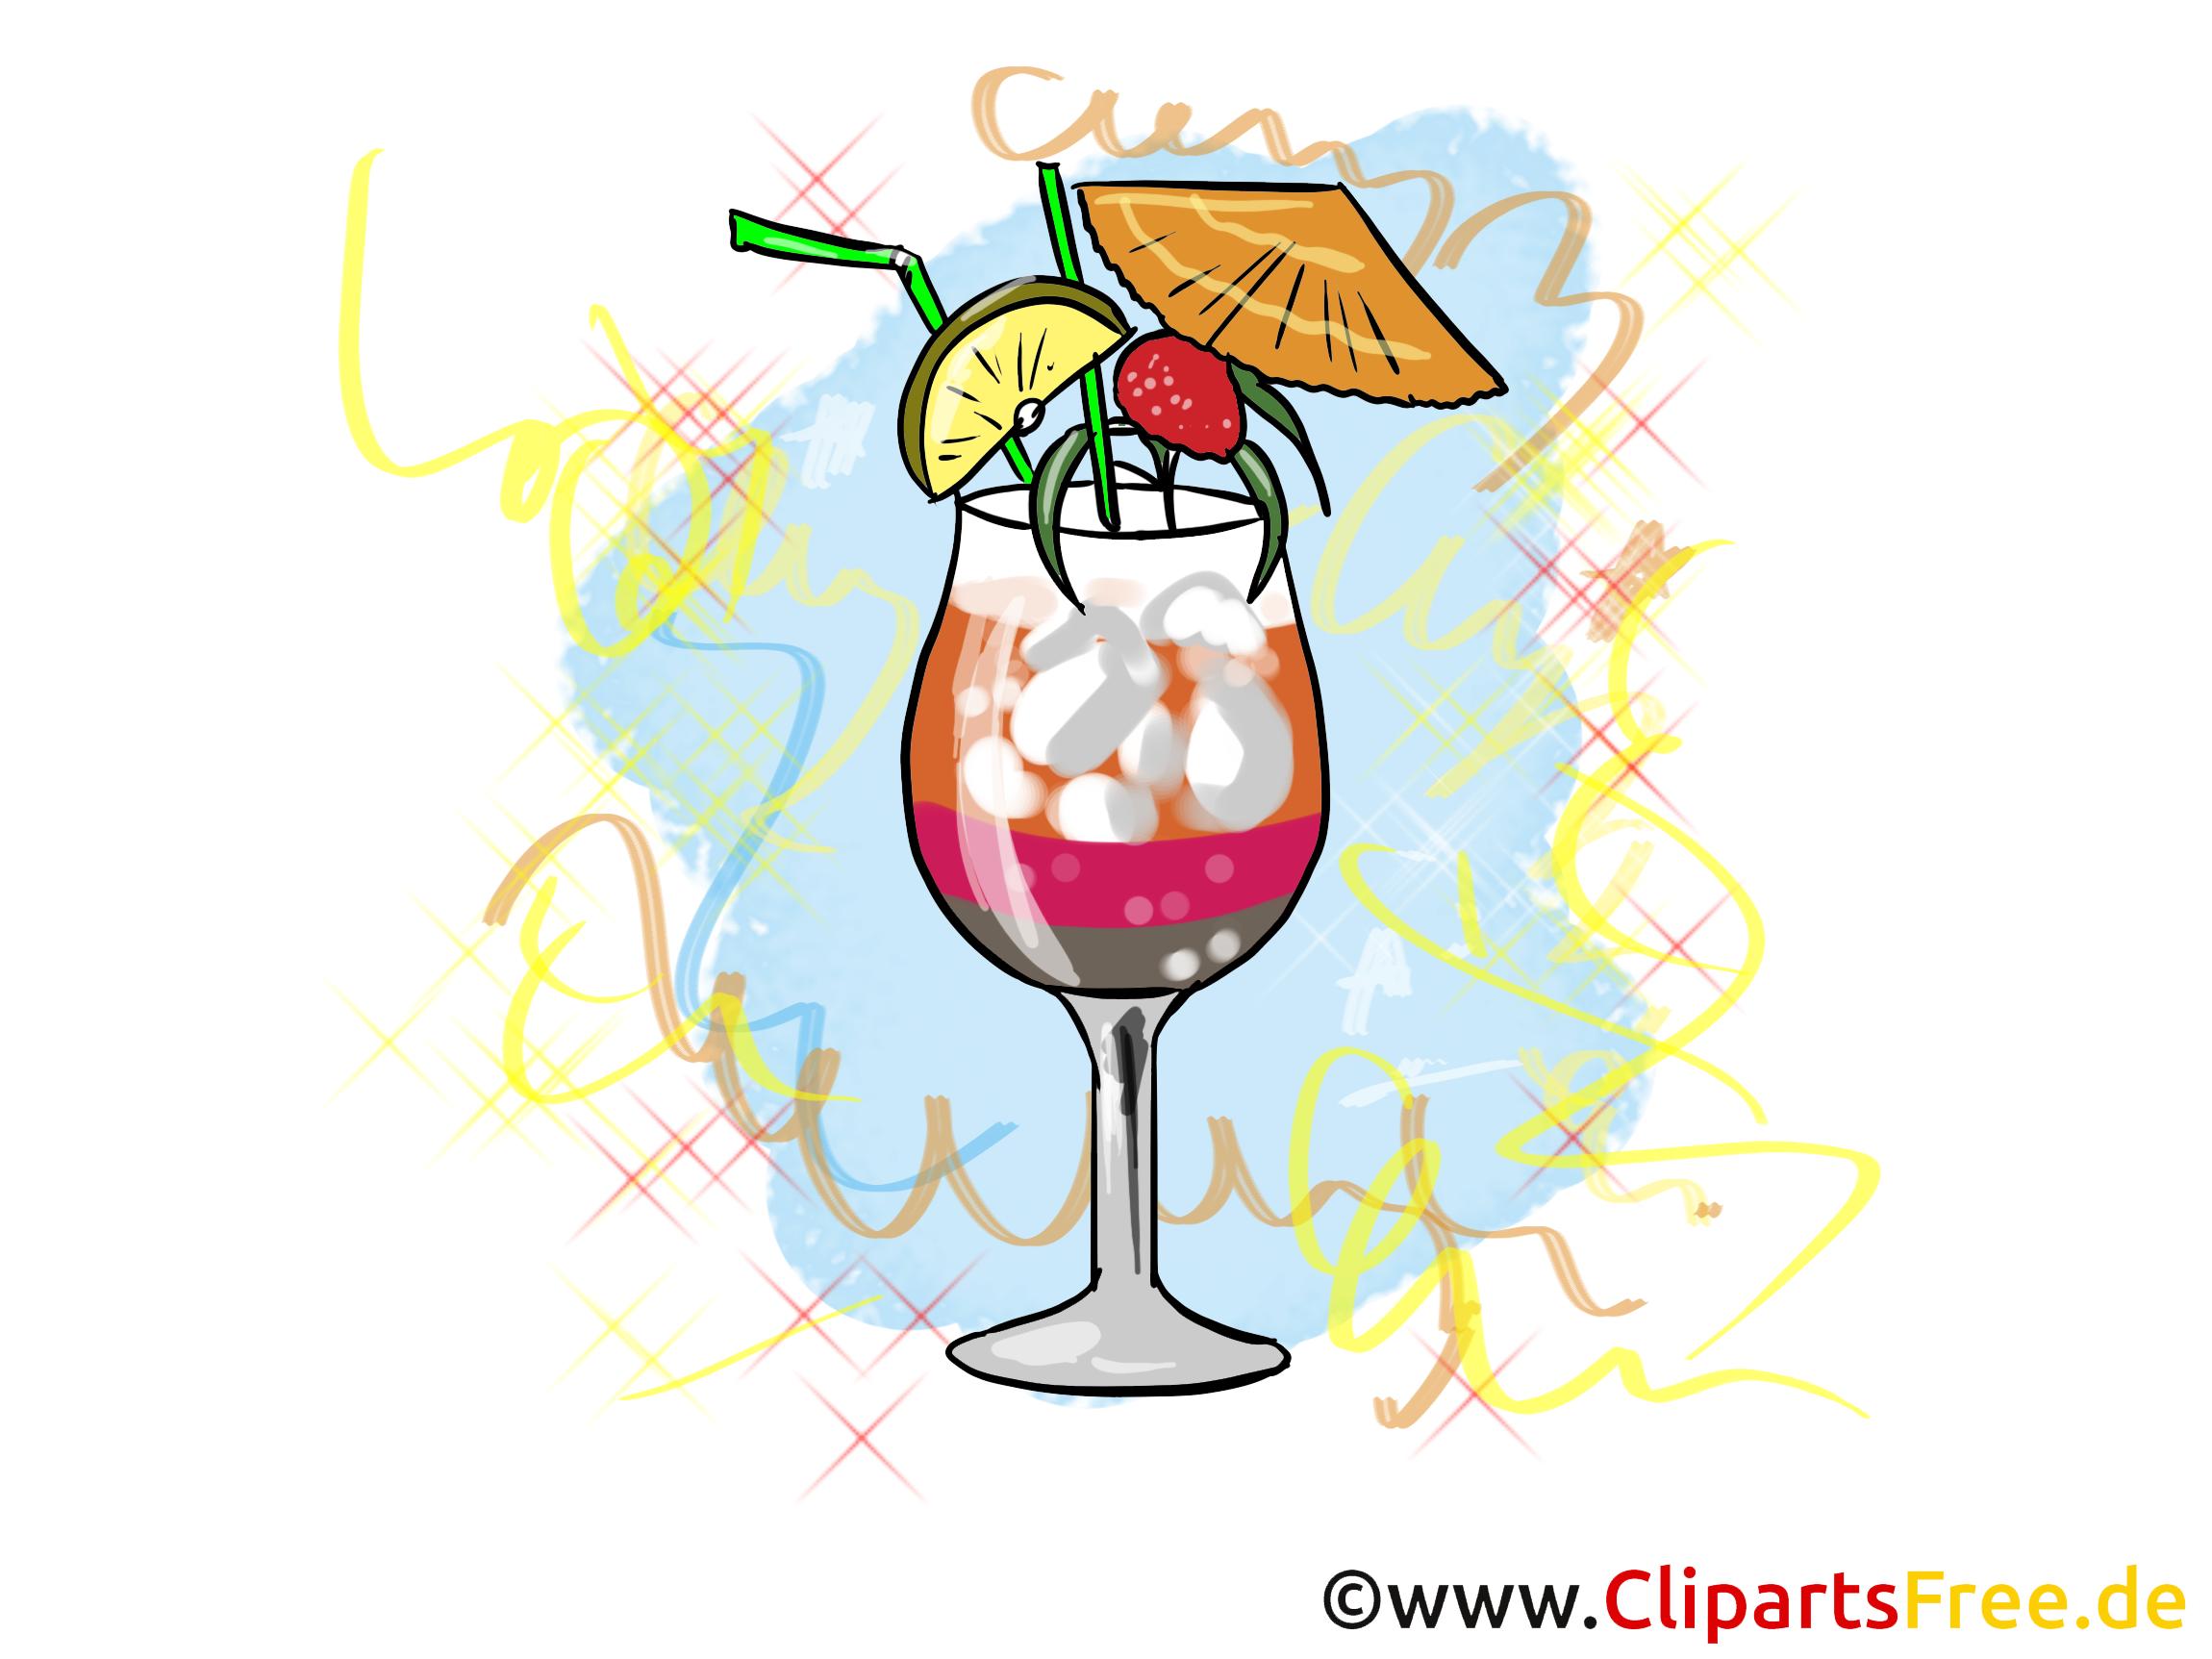 Cocktails cliparts kostenlos stock Cocktails cliparts kostenlos - ClipartFest stock